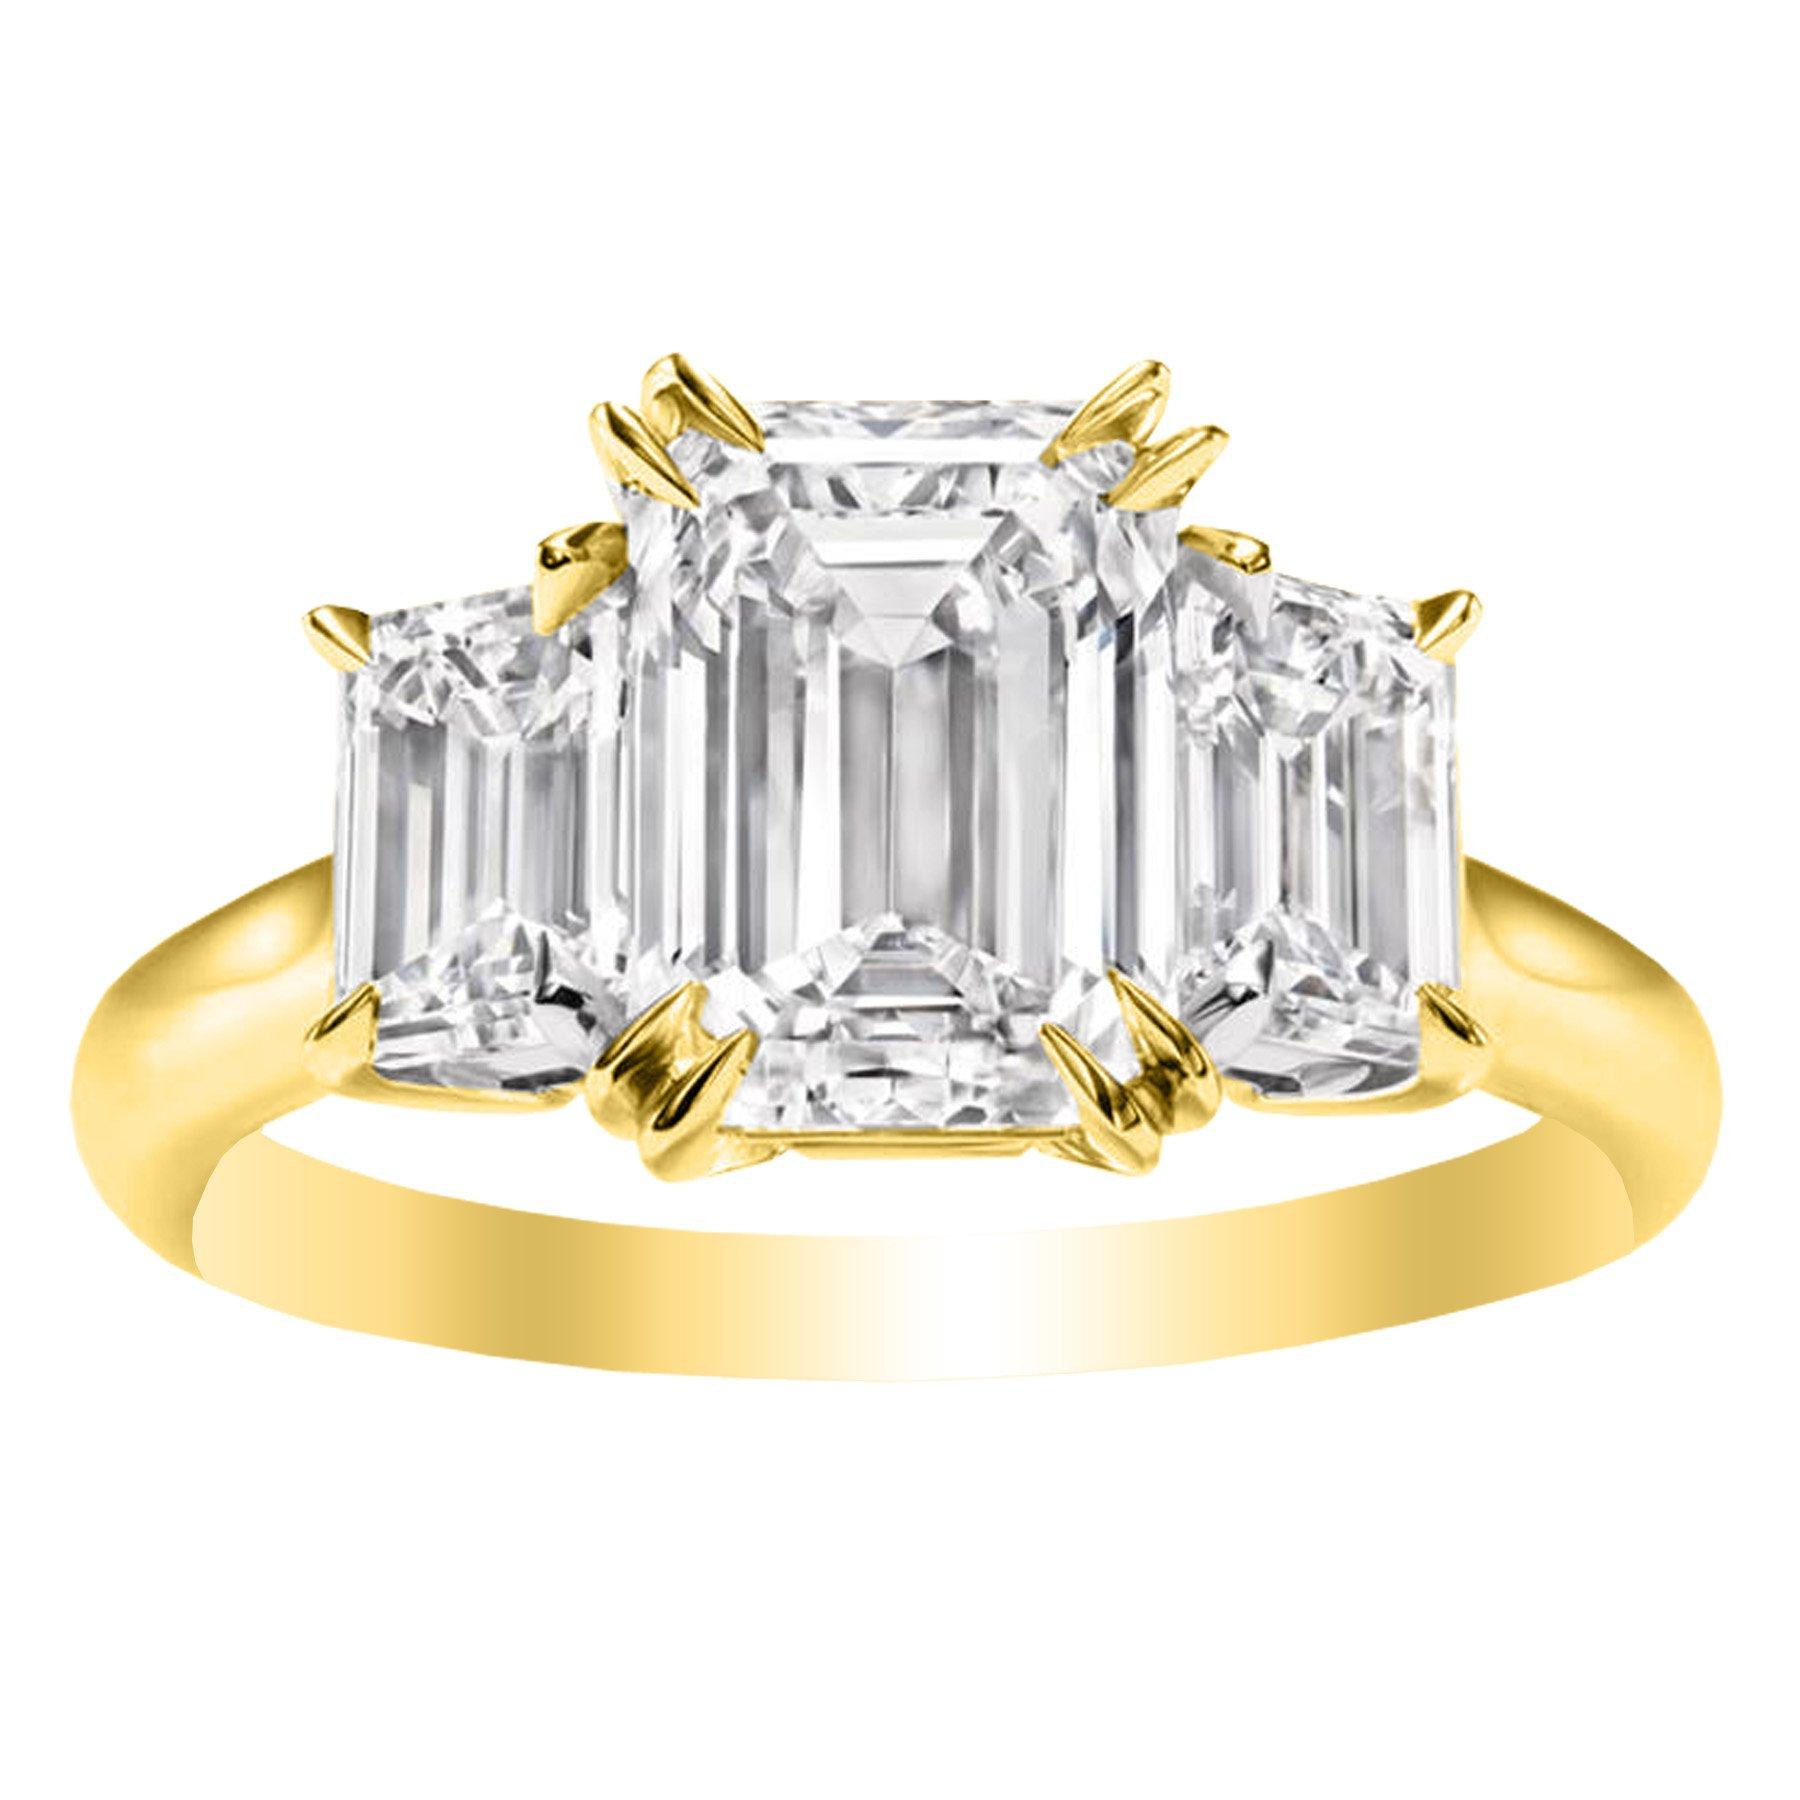 1 Carat 14K Yellow Gold Emerald Cut 3 Three Stone Diamond Engagement Ring (G Color VS1-VS2 Clarity)